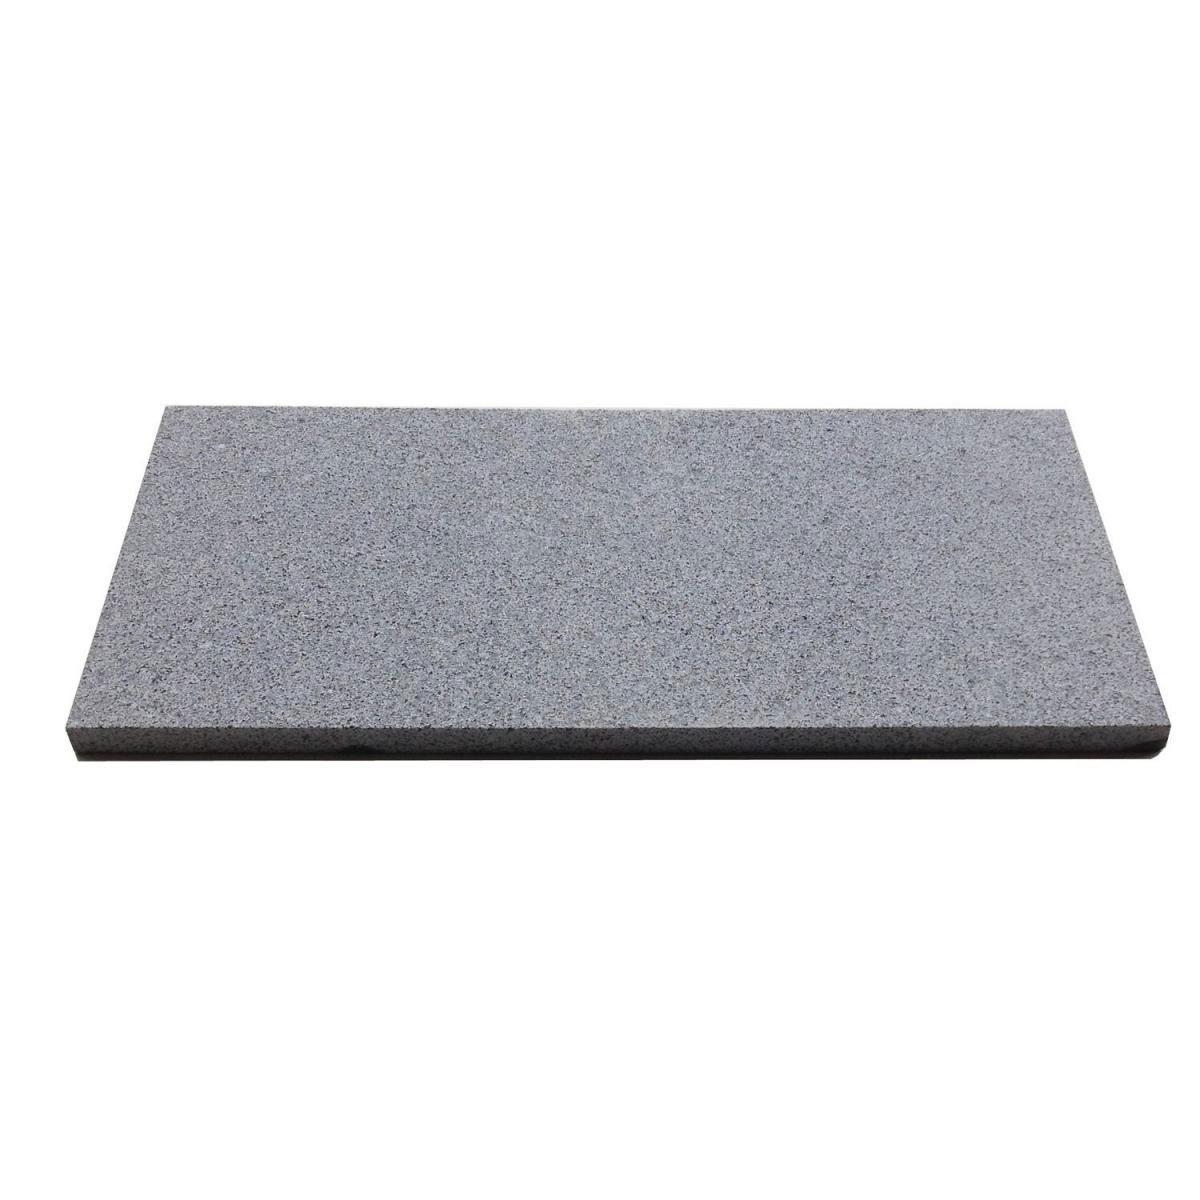 Wingart Granit Terrassenplatte, 60x30 cm, graphit-grau